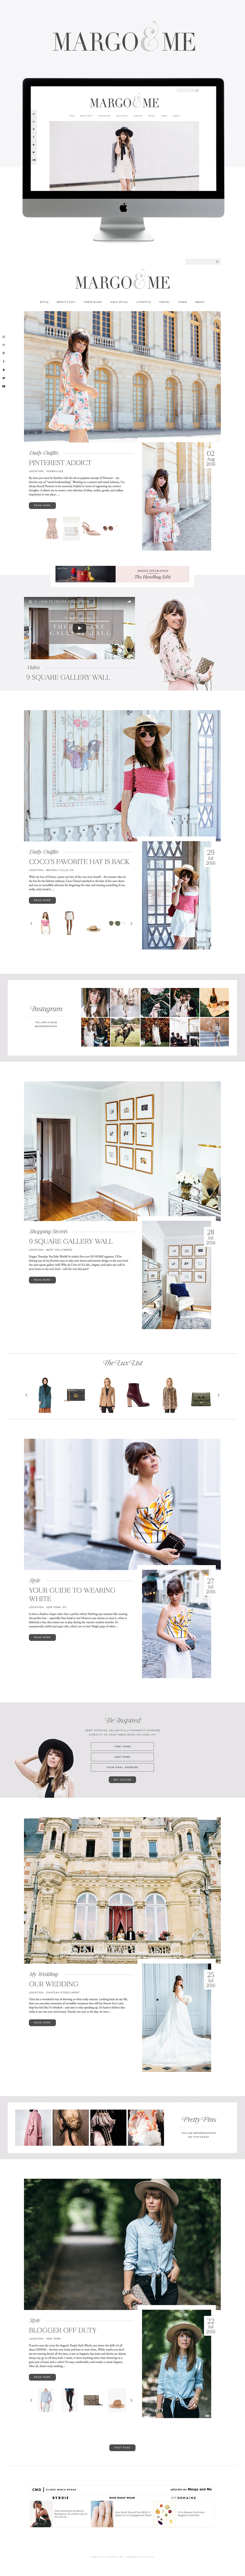 DesignReleaseTemplateA-Margo.jpg